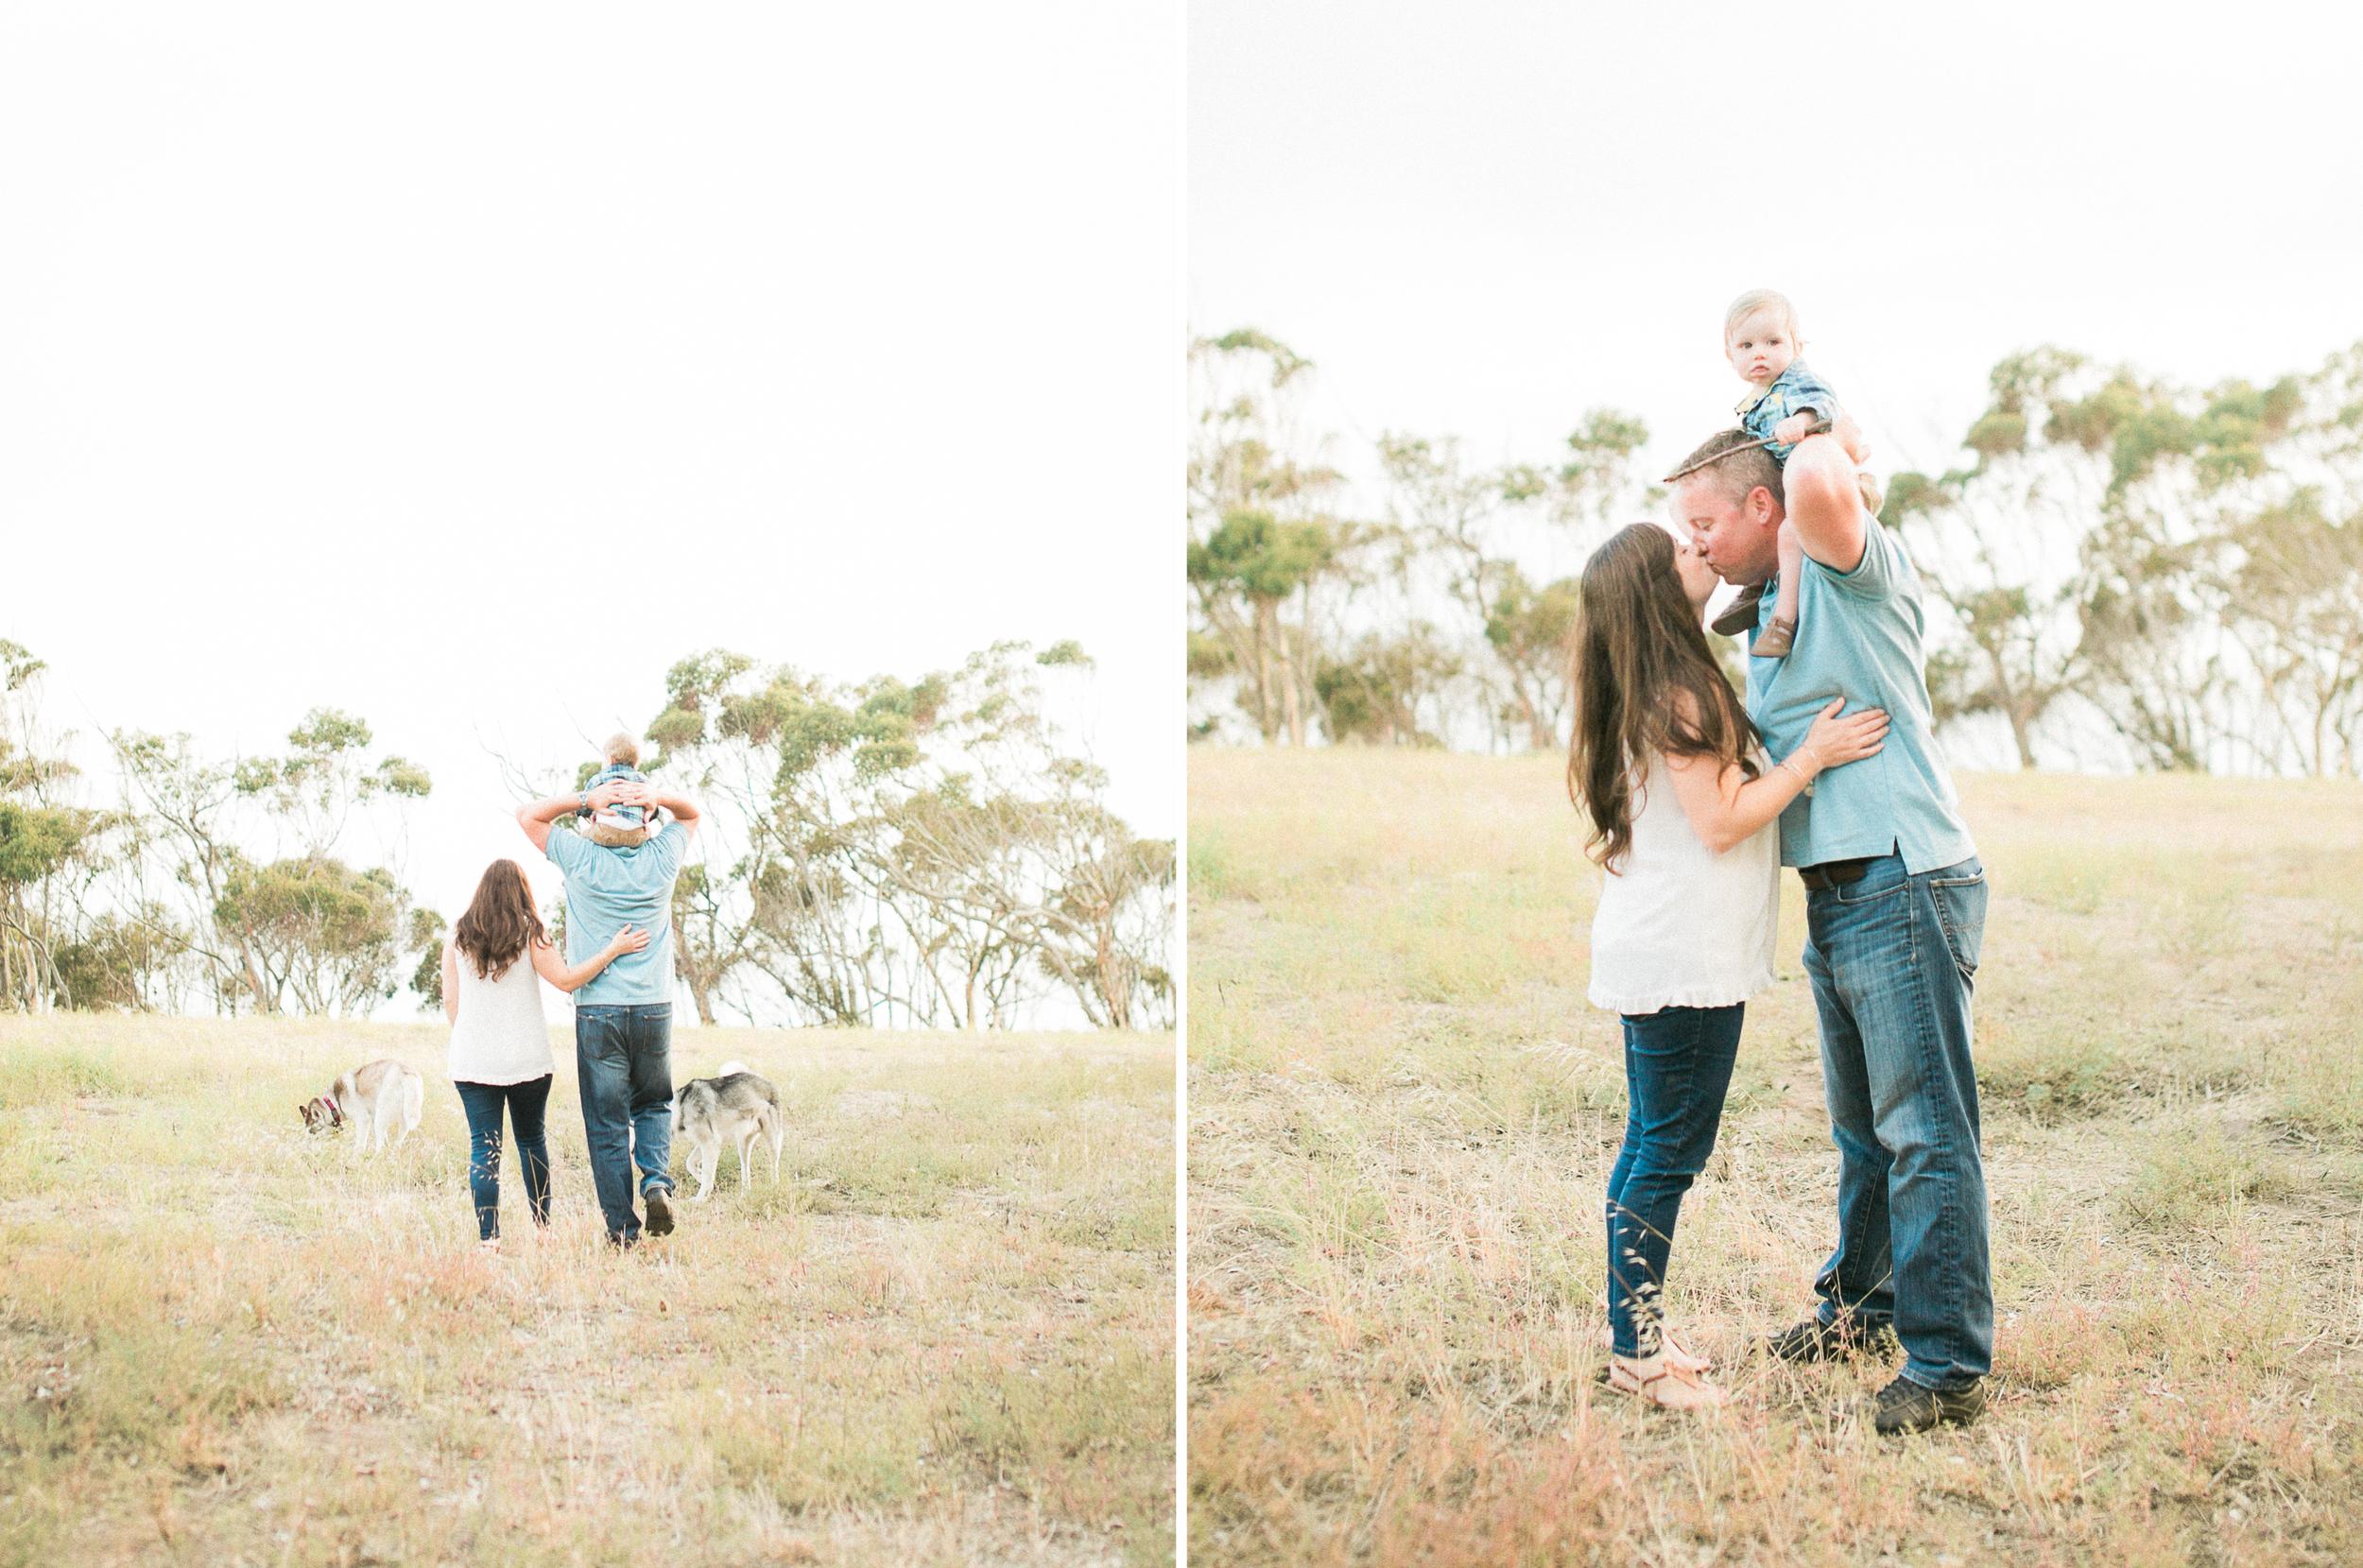 la-jolla-family-photos-3.jpg